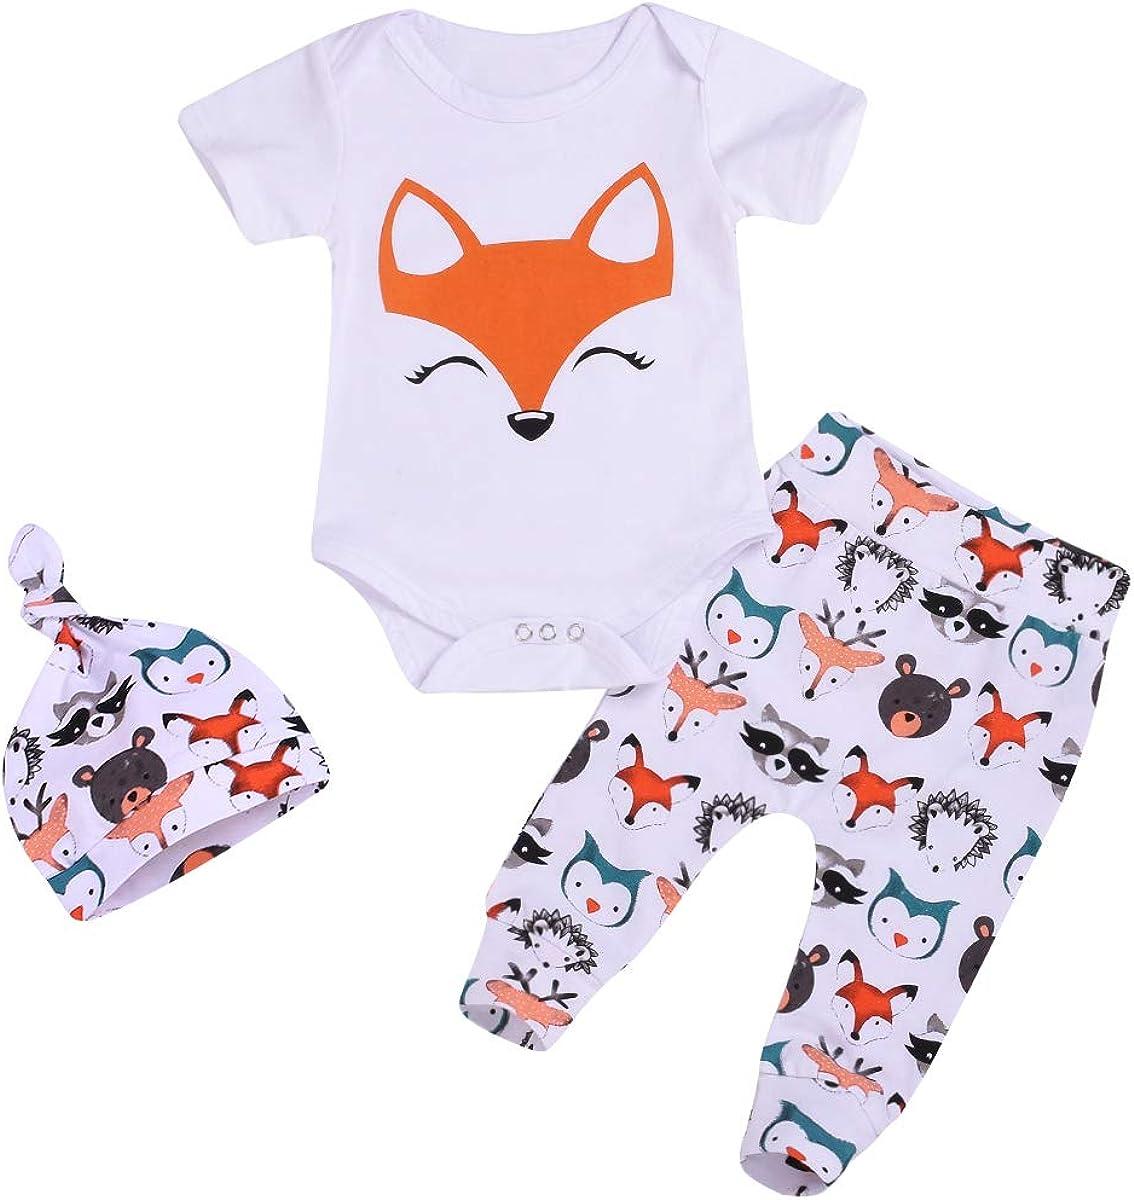 3Pcs Baby Boy half Girl Clothes Over item handling ☆ Infant Animals Top Pan Nowborn Romper